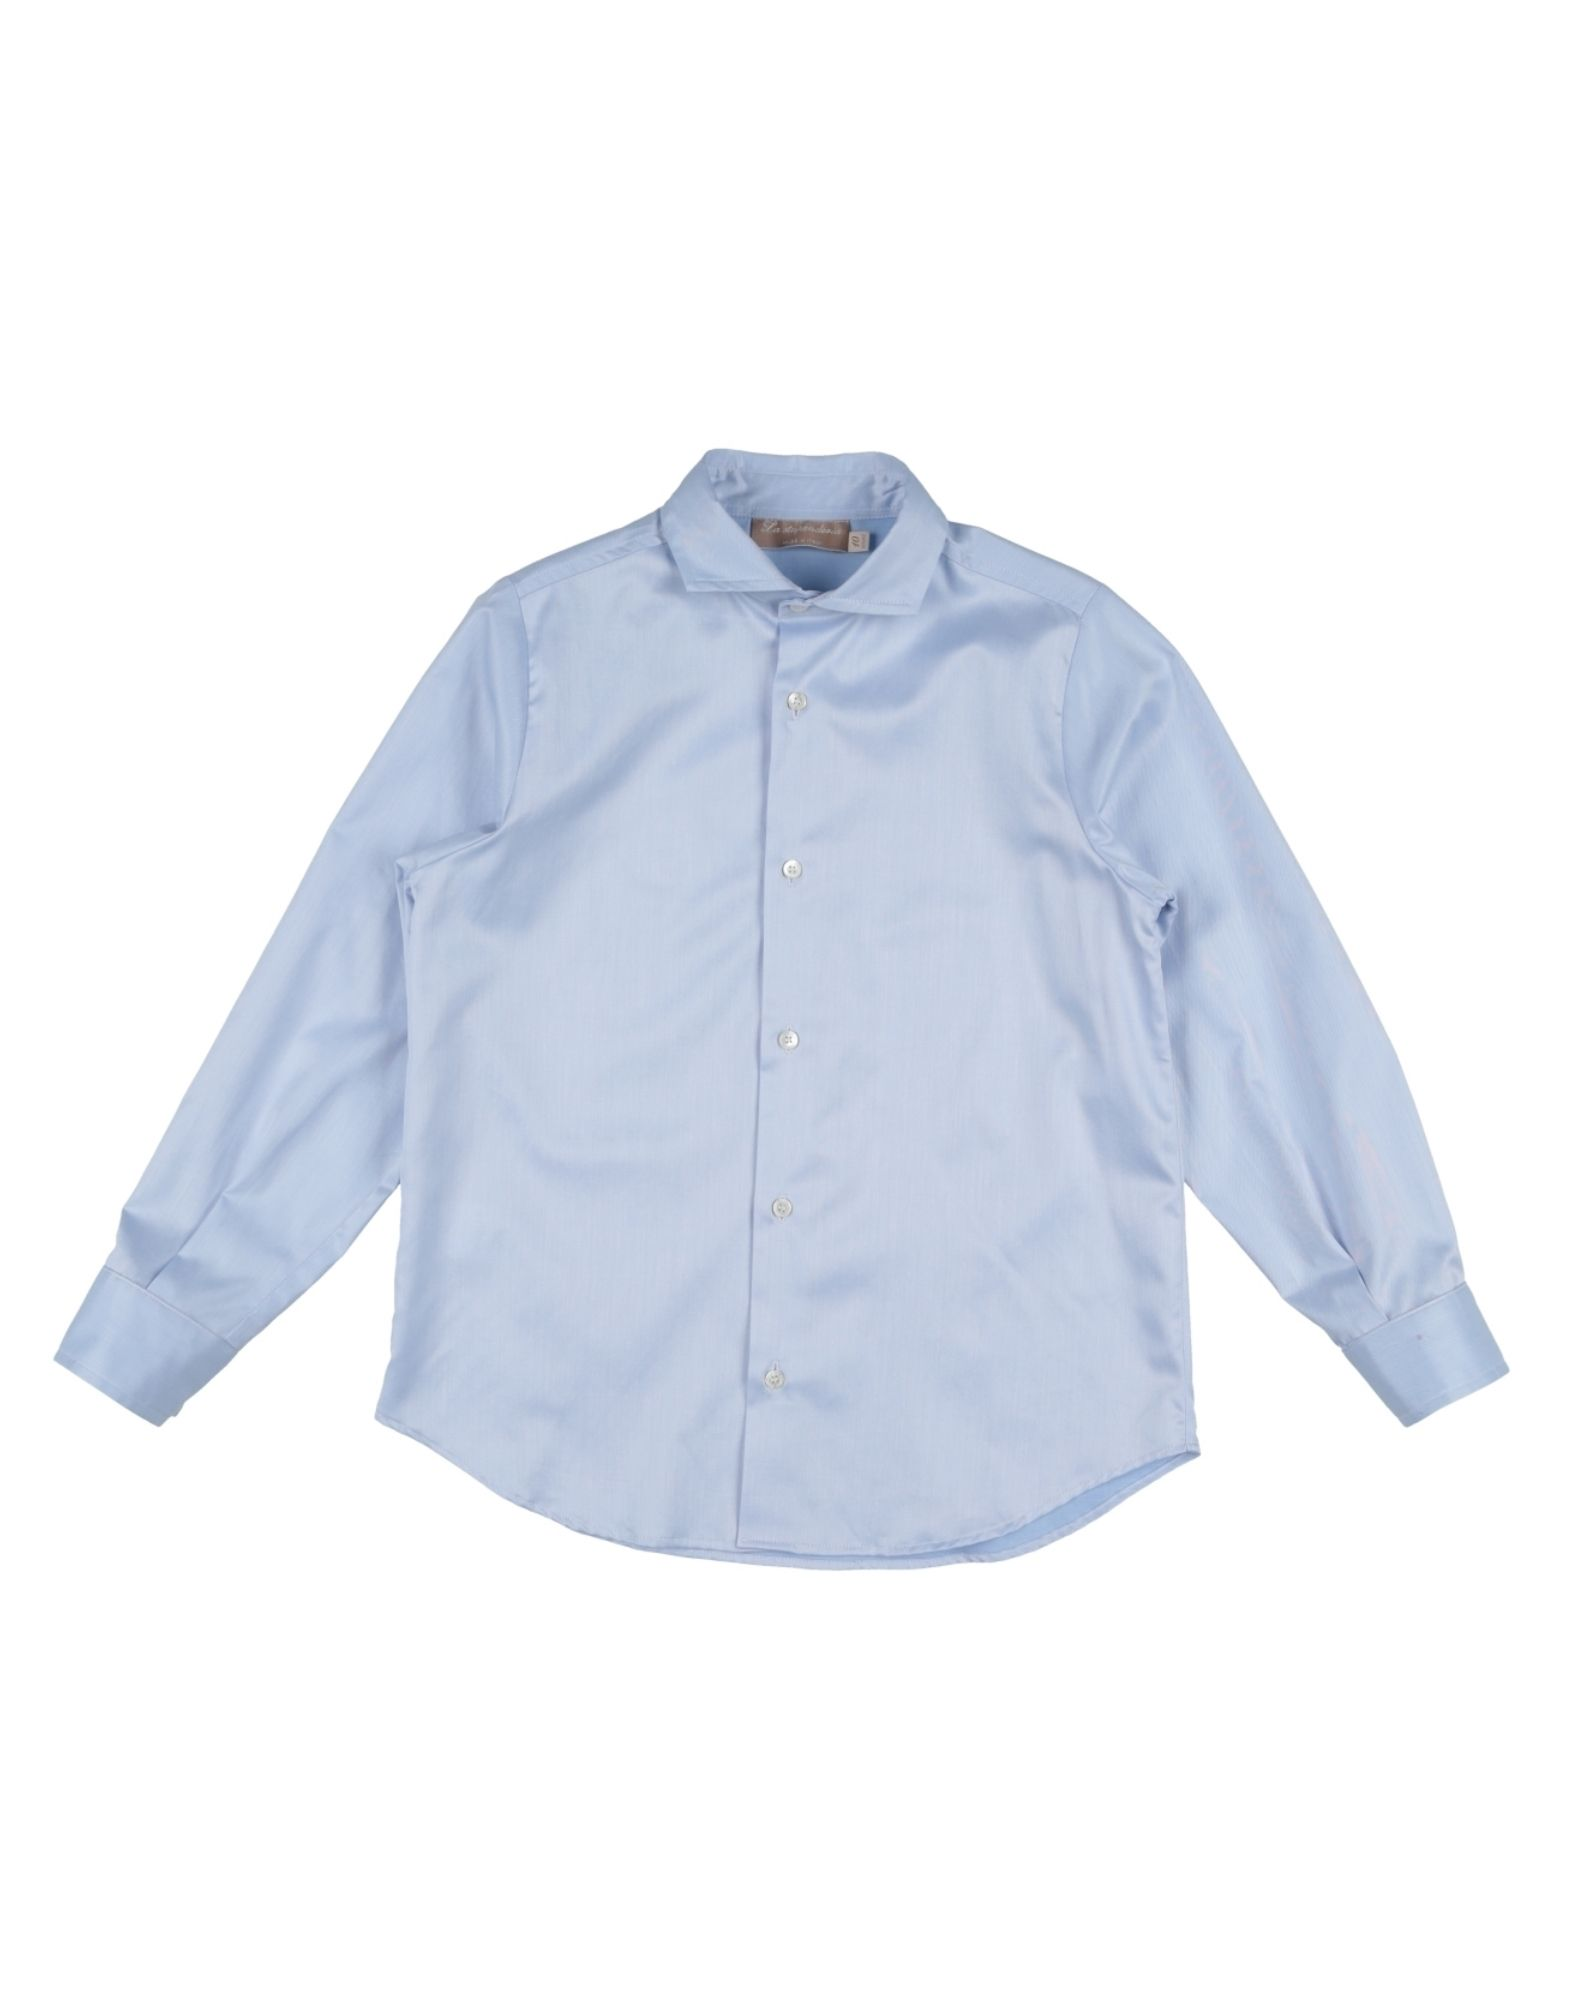 LA STUPENDERIA Solid Color Shirt in Sky Blue